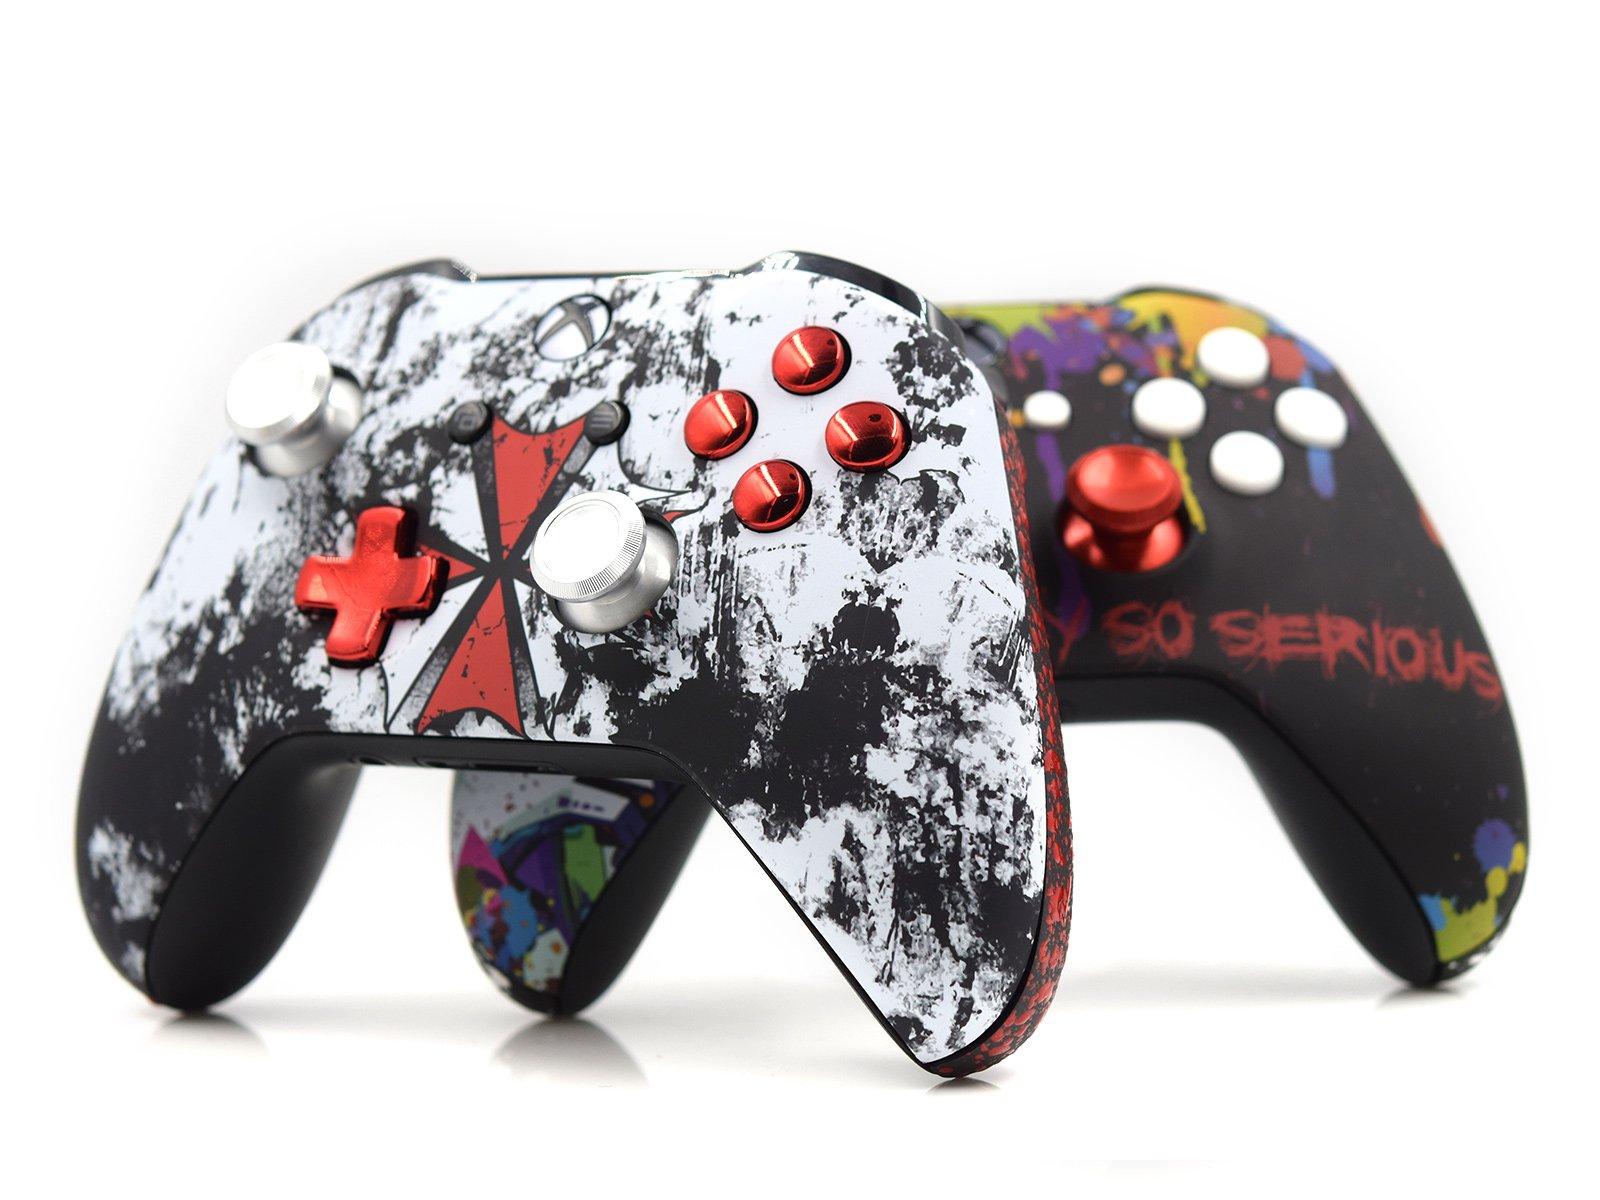 Custom Xbox One S Controller - Resident Evil